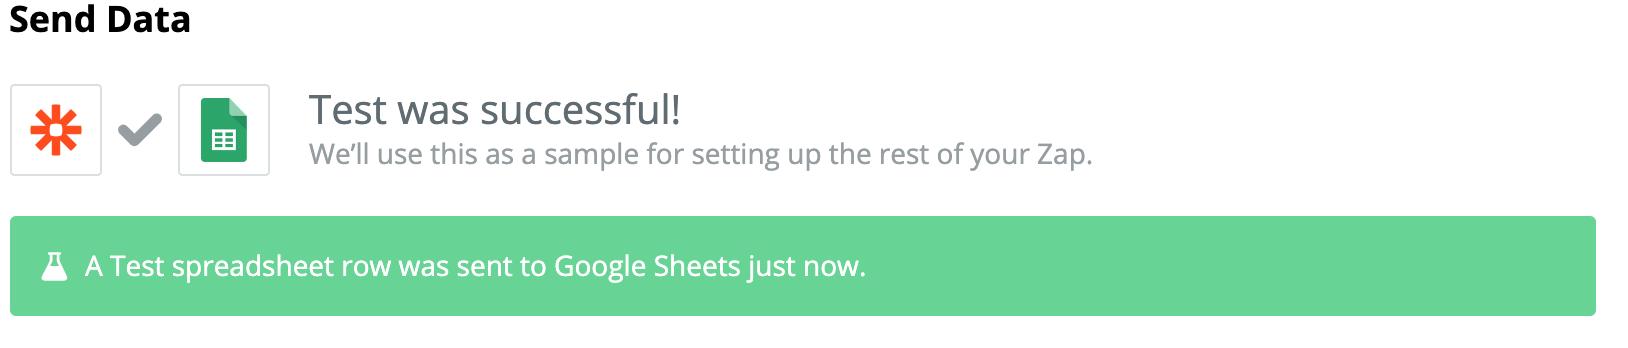 Google Sheets data successfully sent